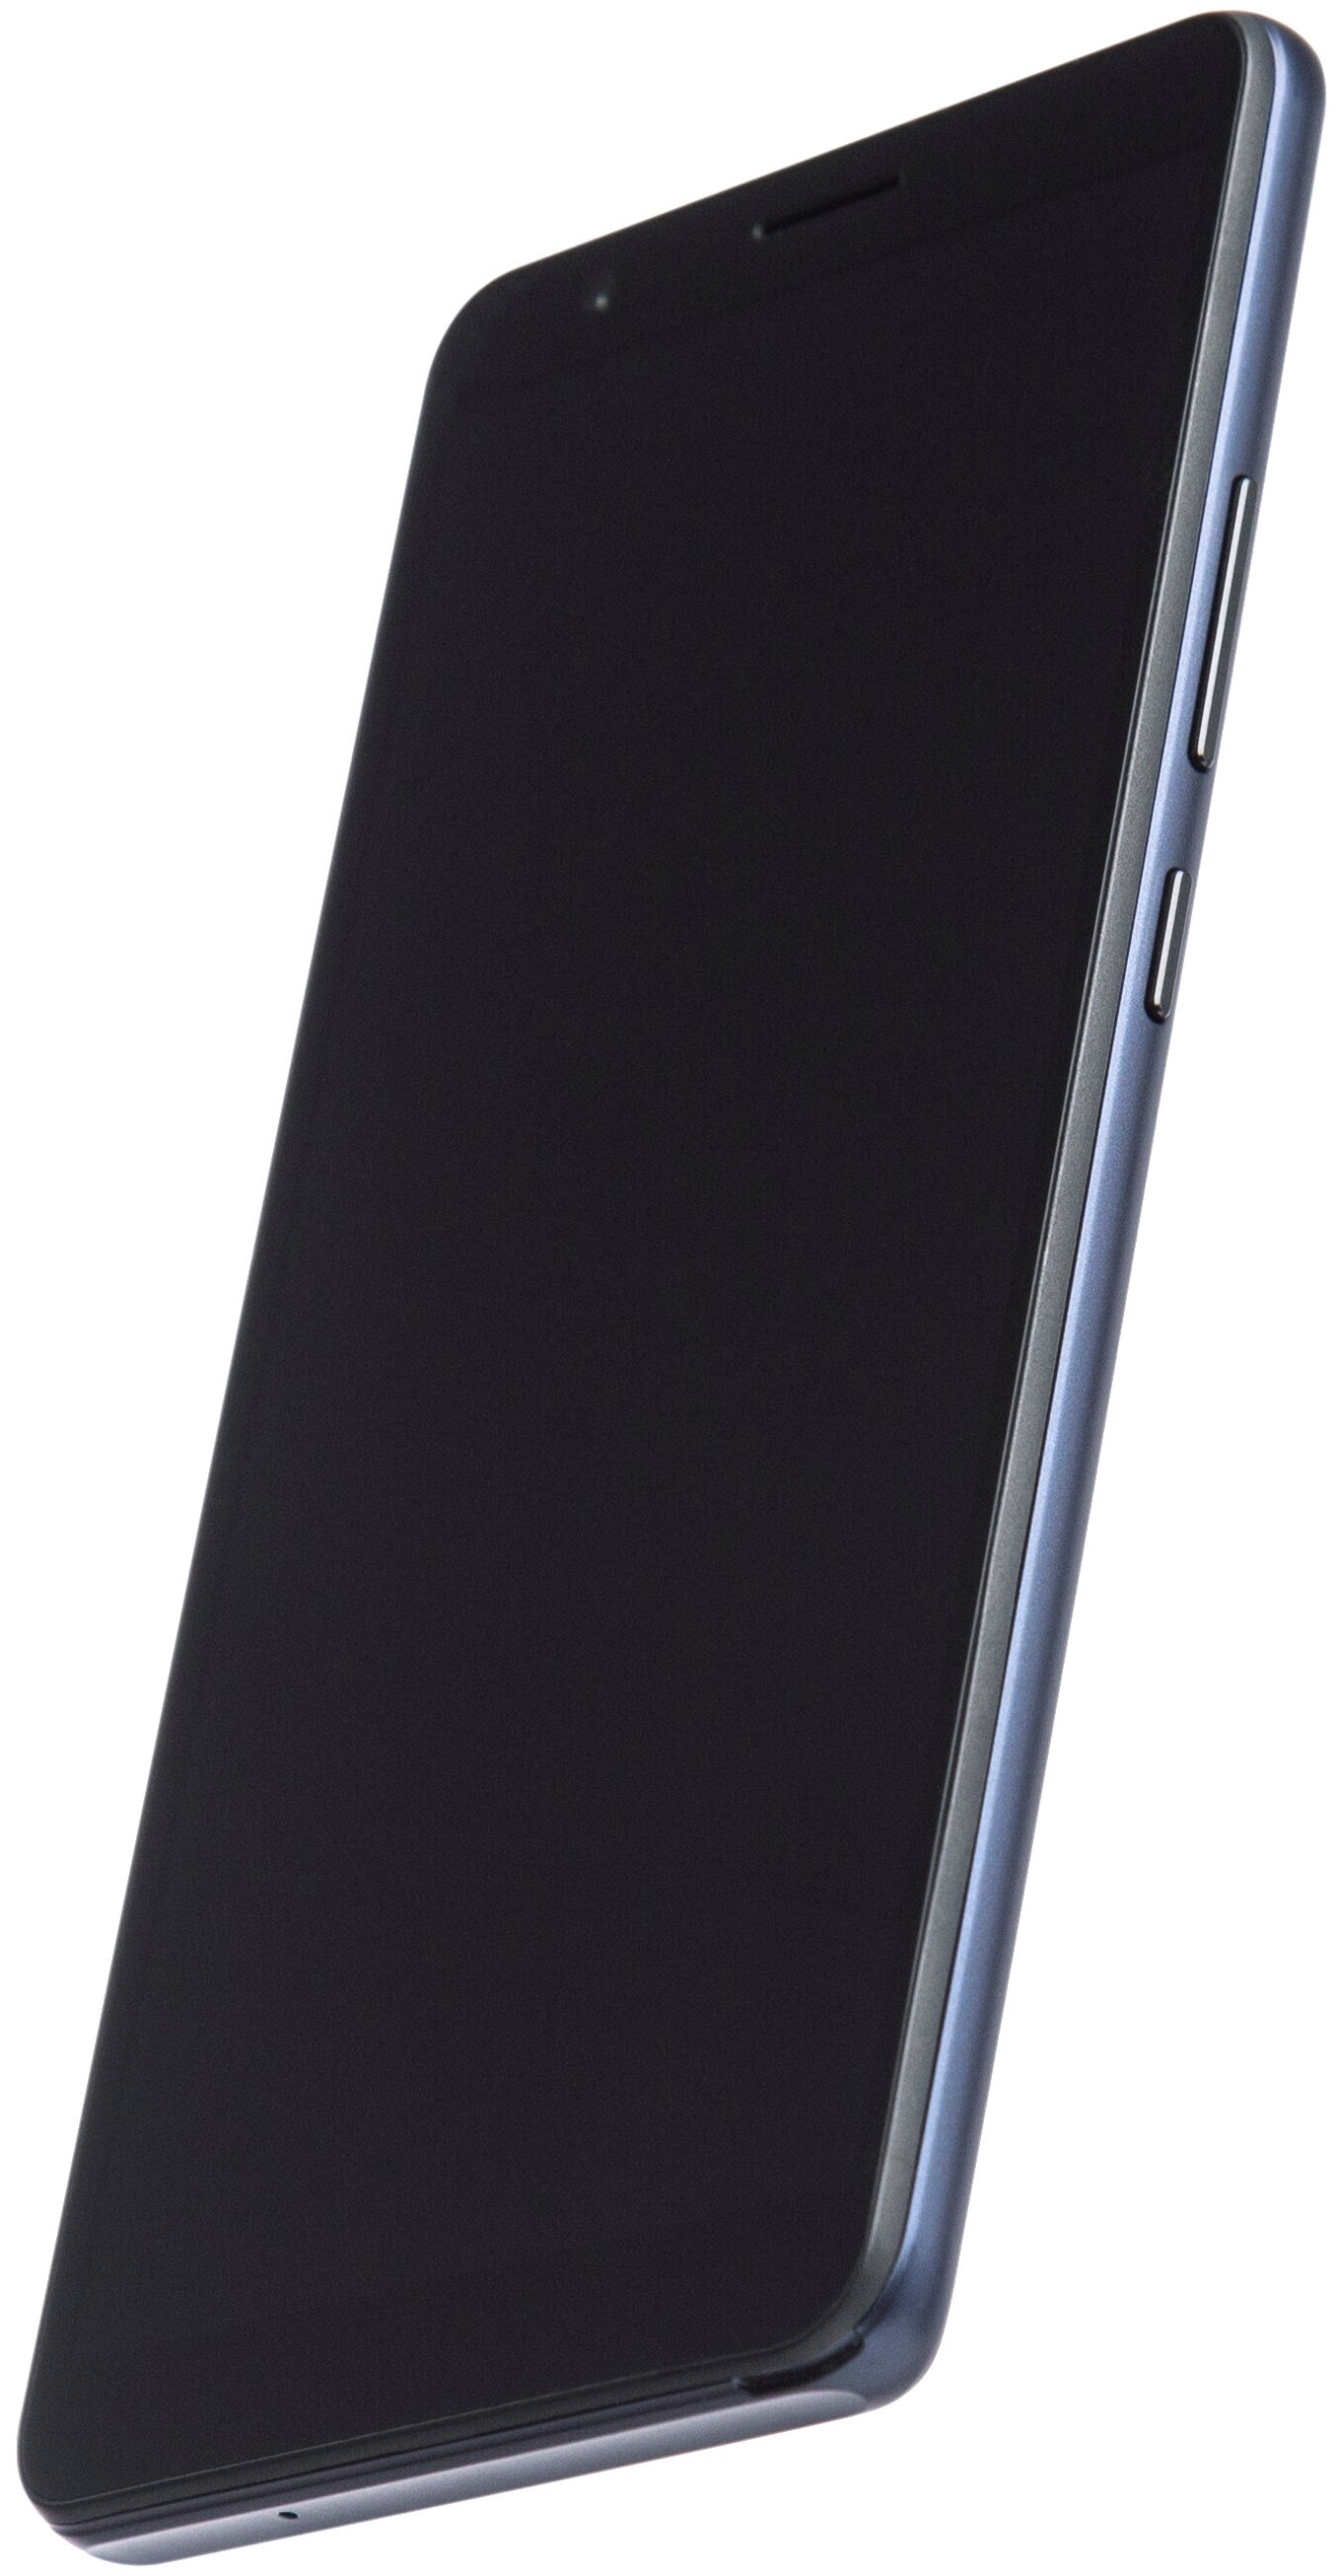 ZTE Blade L210 - процессор: Unisoc SC7731E